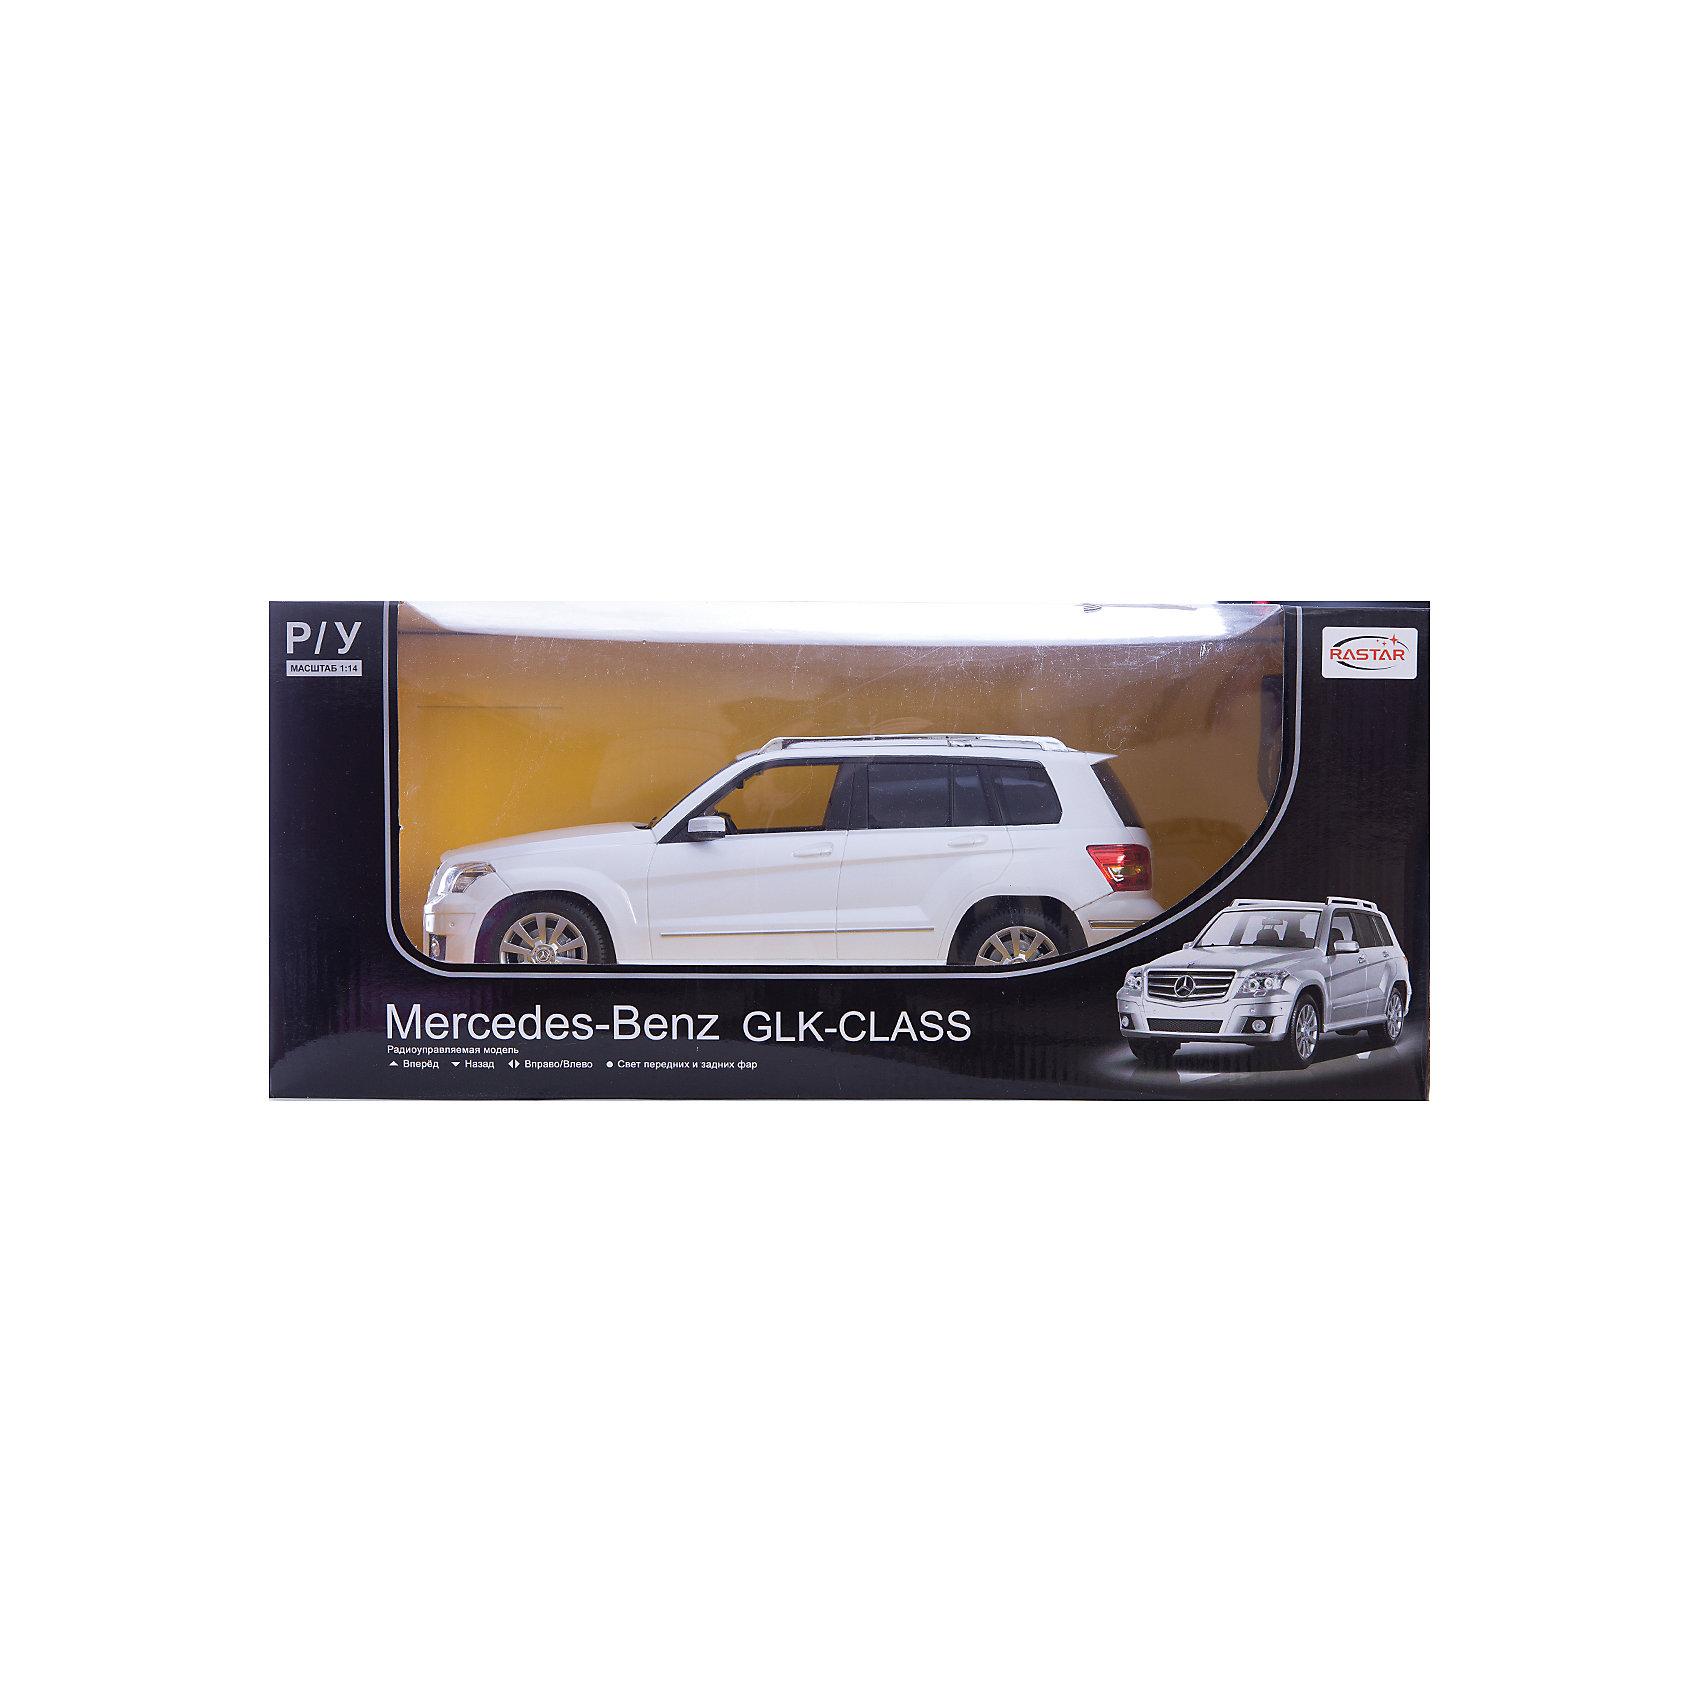 - Машина MERCEDES GLK, 1:14, со светом, р/у, RASTAR, белый купить автомобиль б у в донецке до 33000 грн